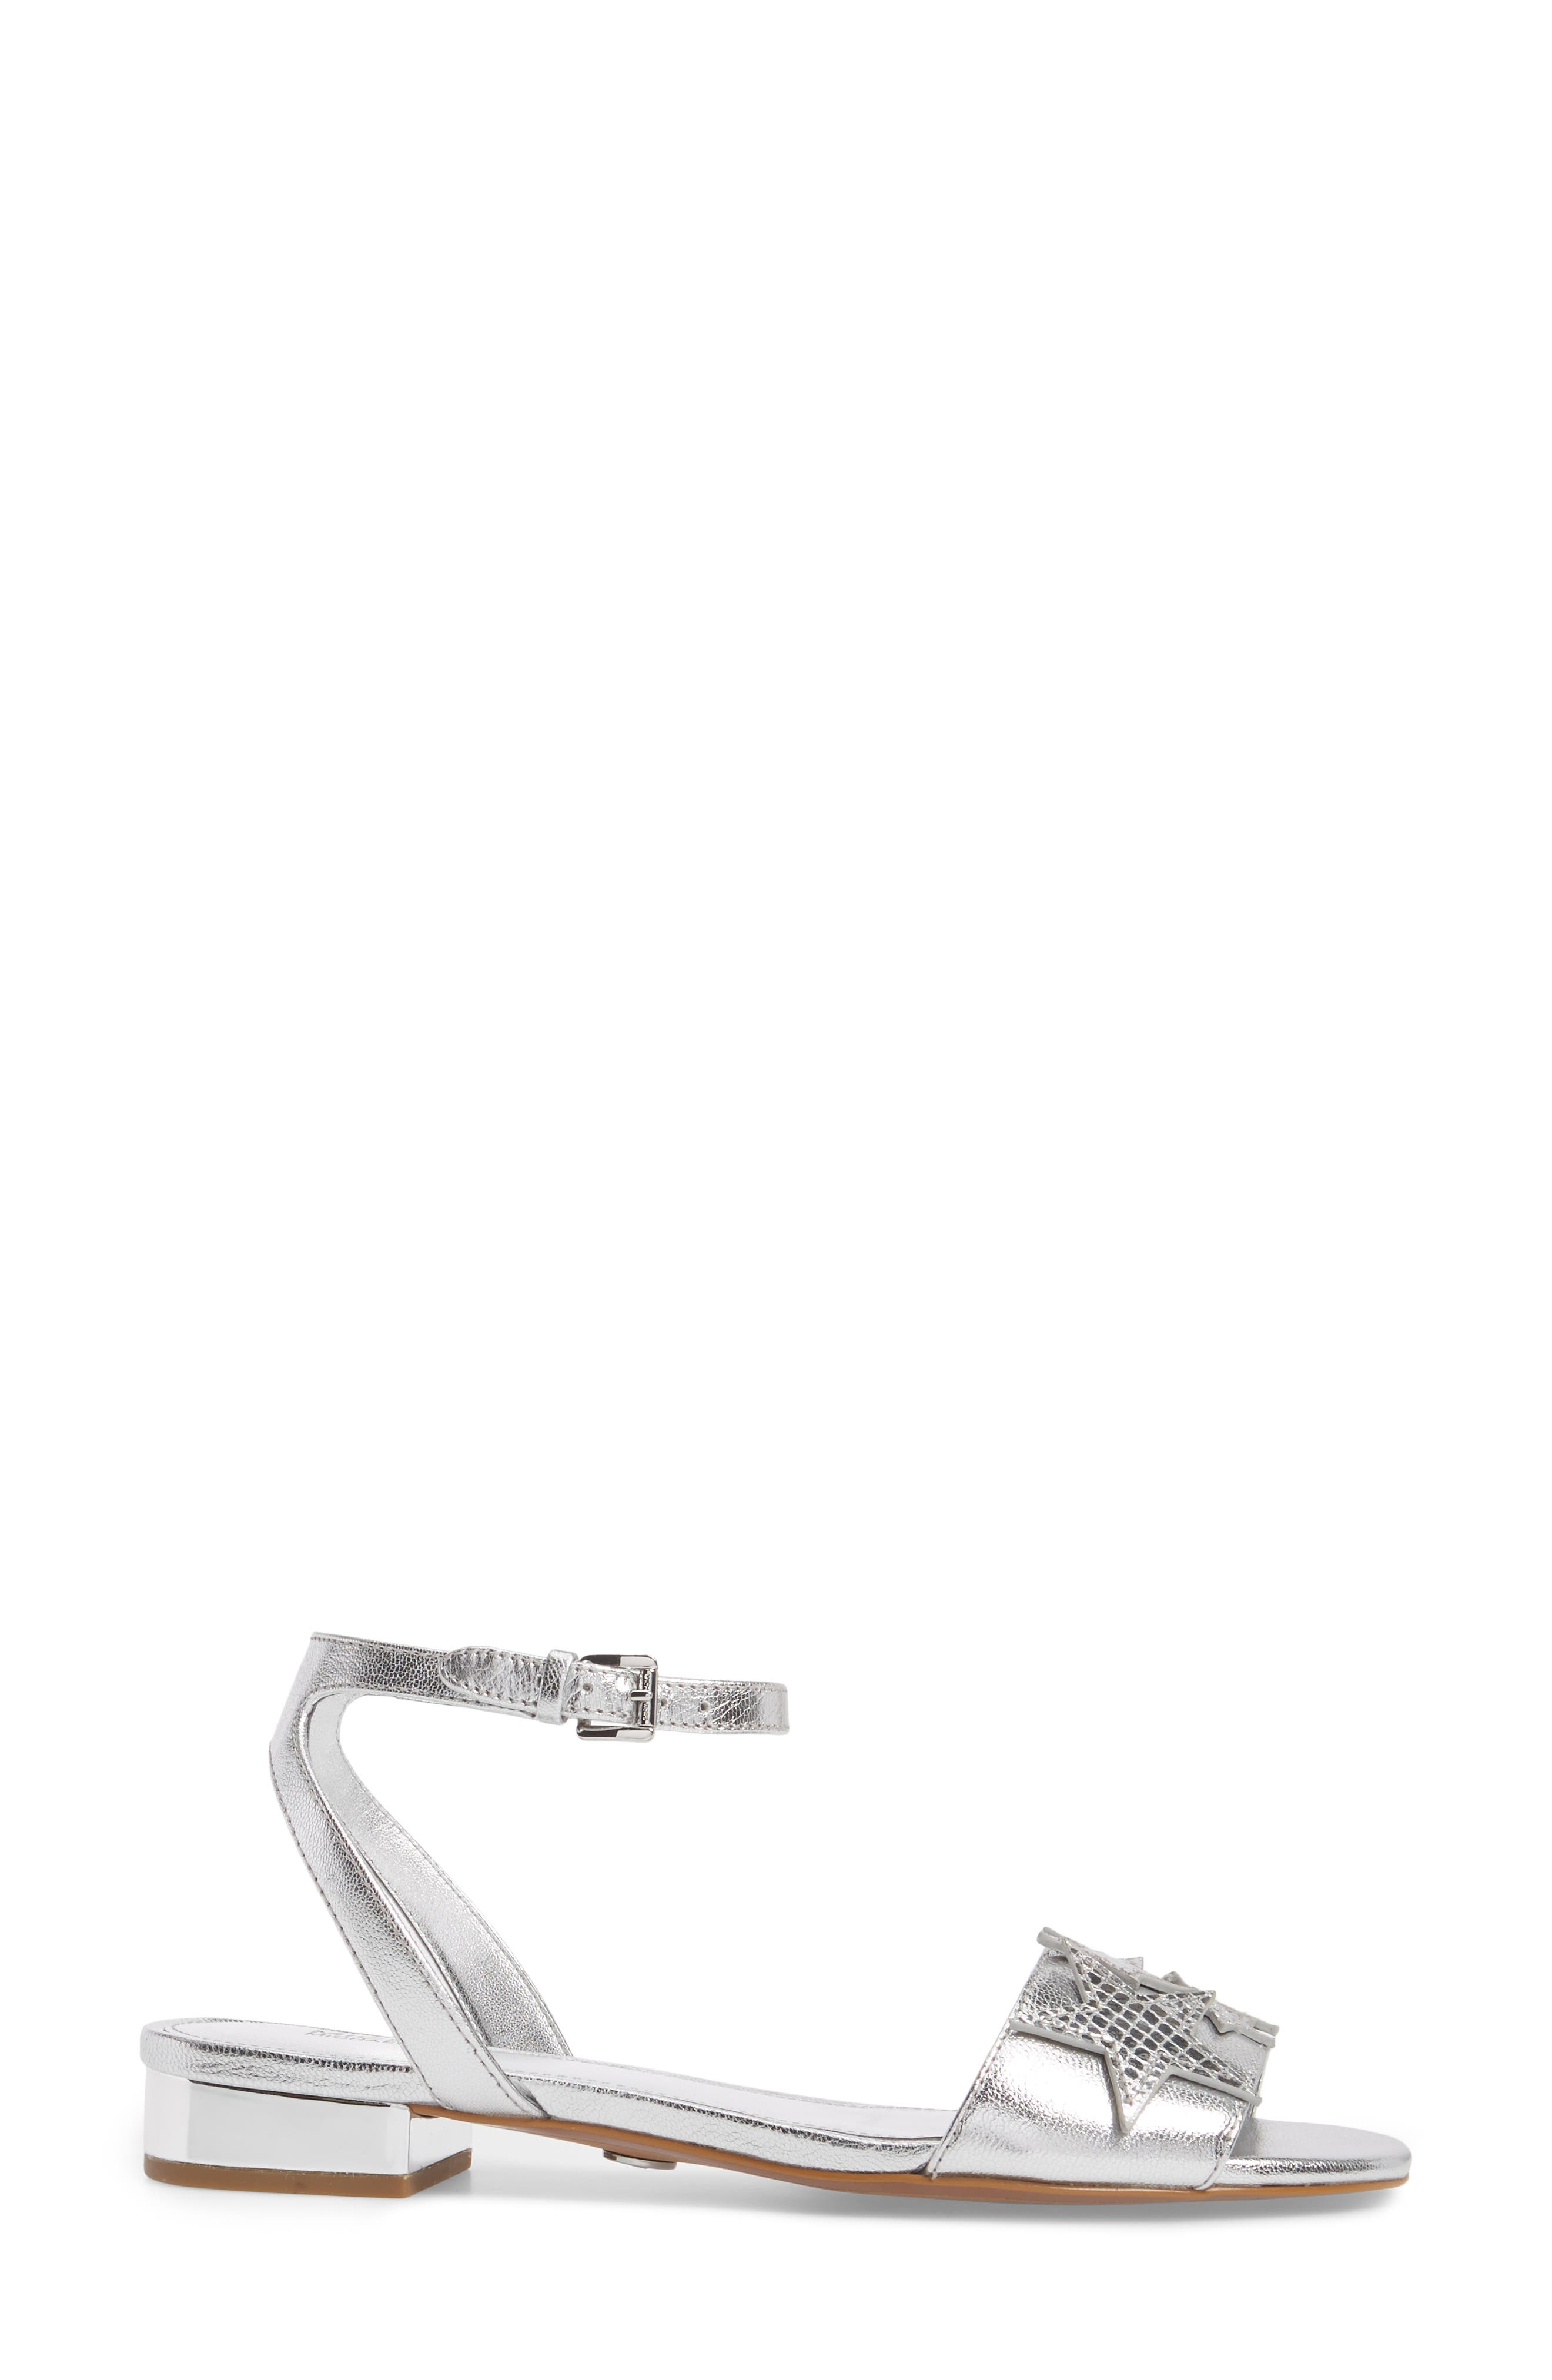 Lexie Star Embellished Sandal,                             Alternate thumbnail 3, color,                             040